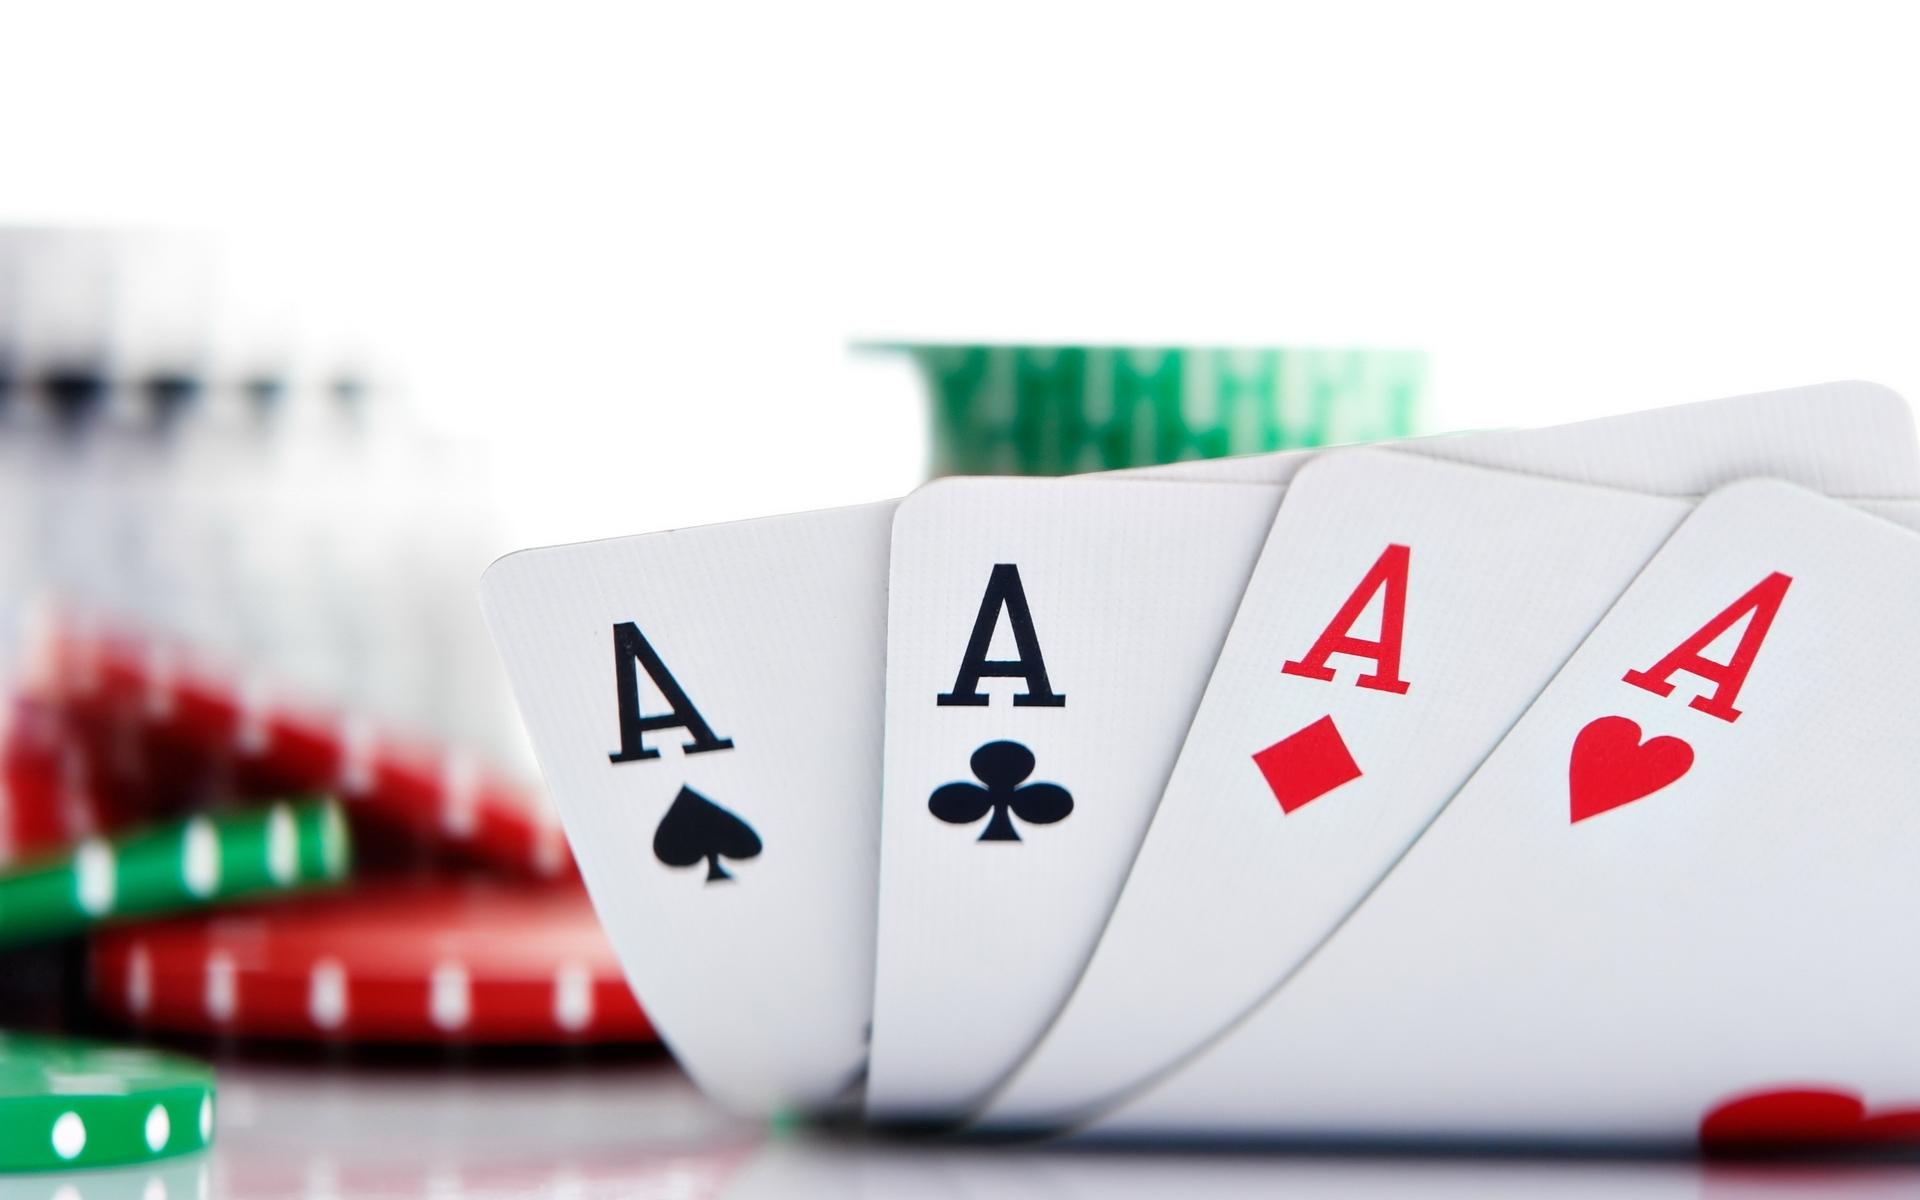 Aces card poker chips wallpaper 1920x1200 35758 WallpaperUP 1920x1200